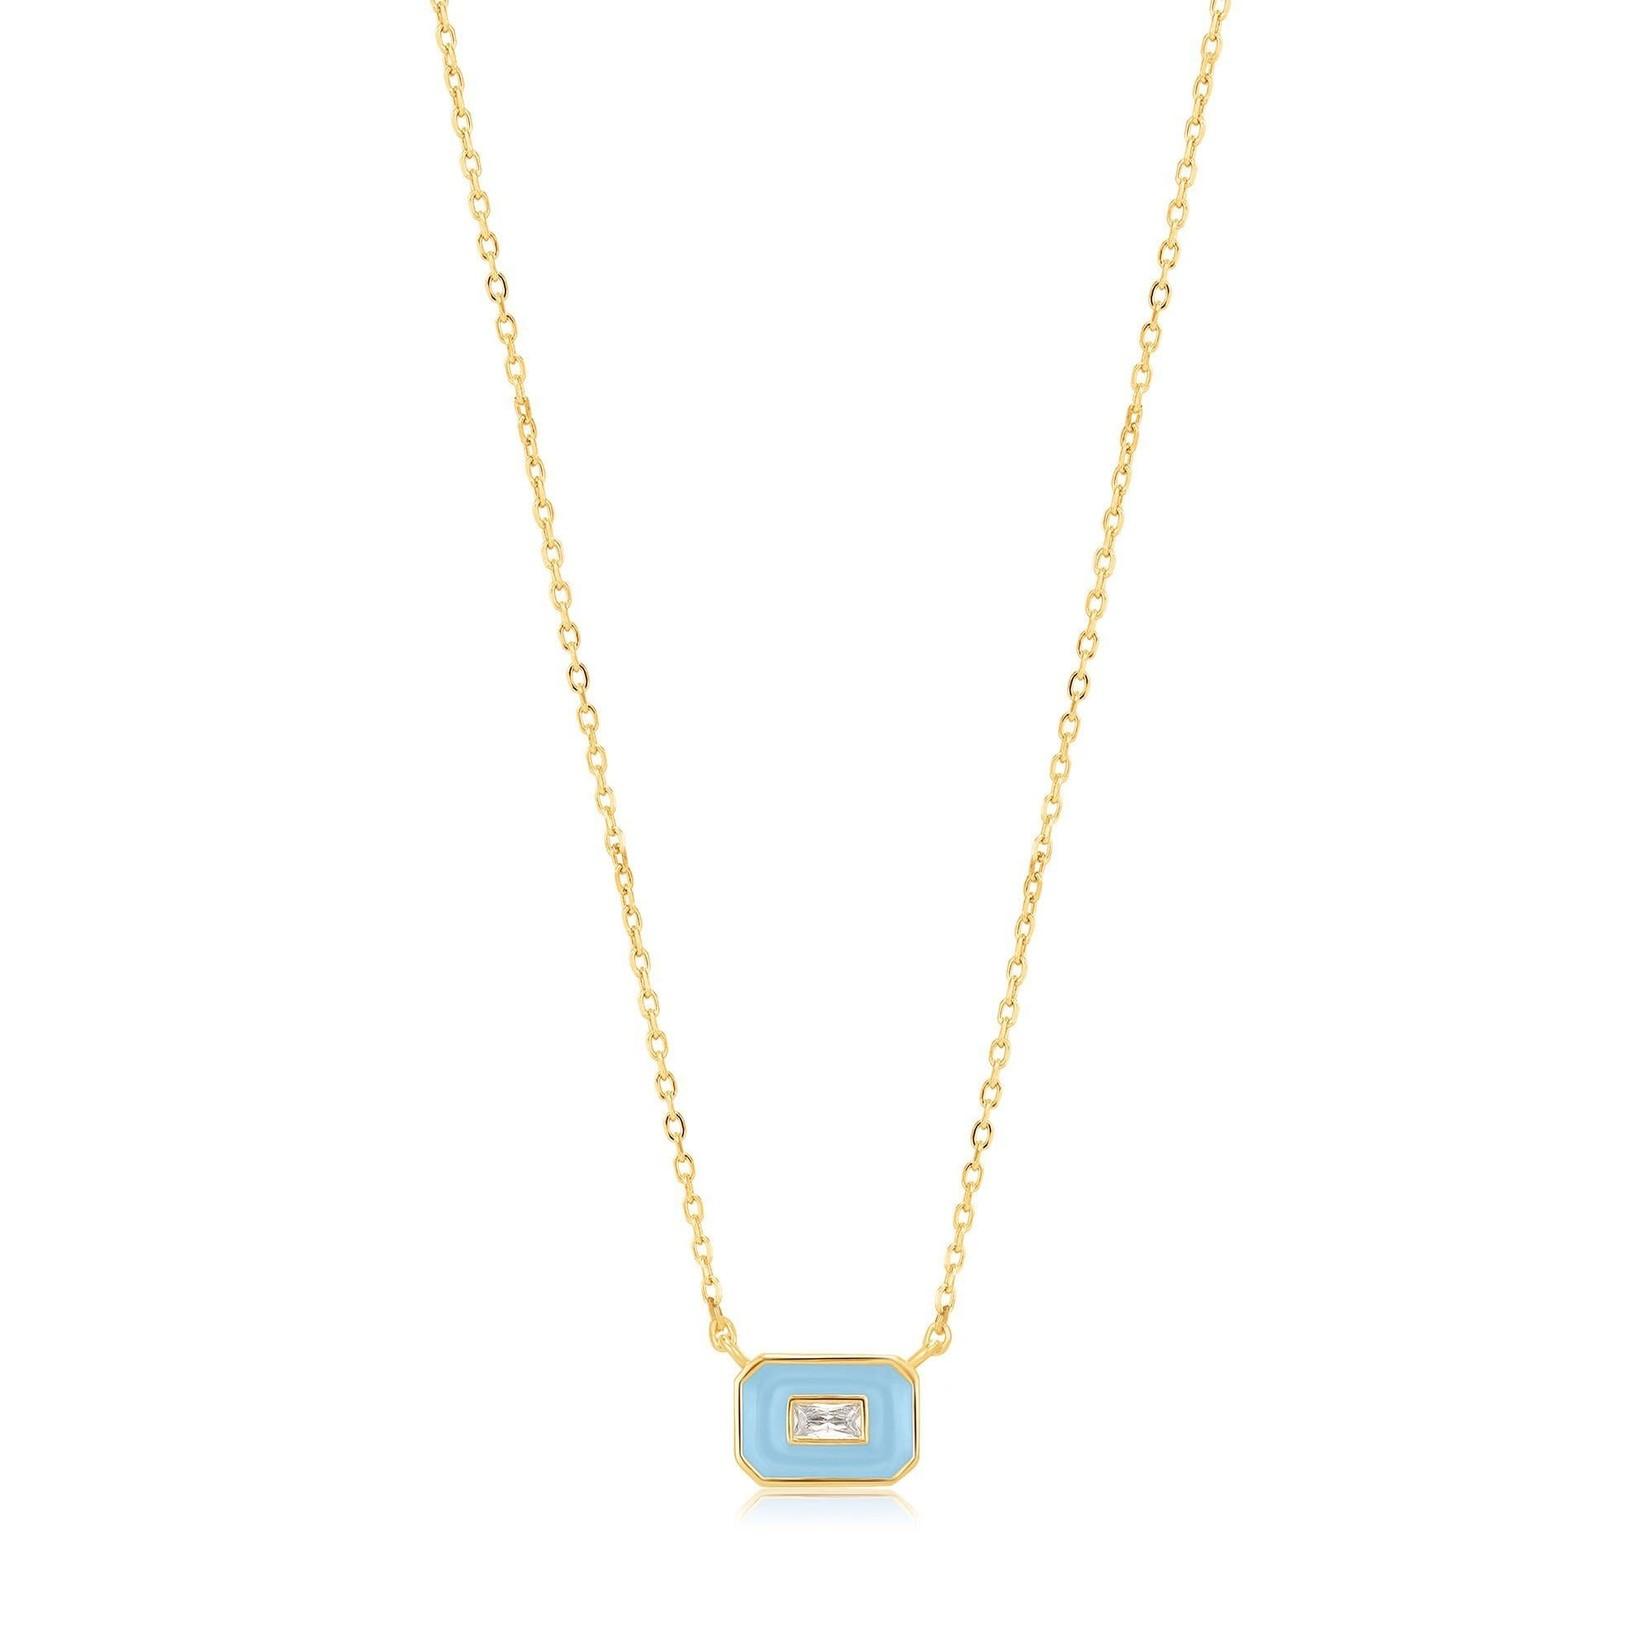 Ania Haie Powder Blue Enamel Emblem Necklace